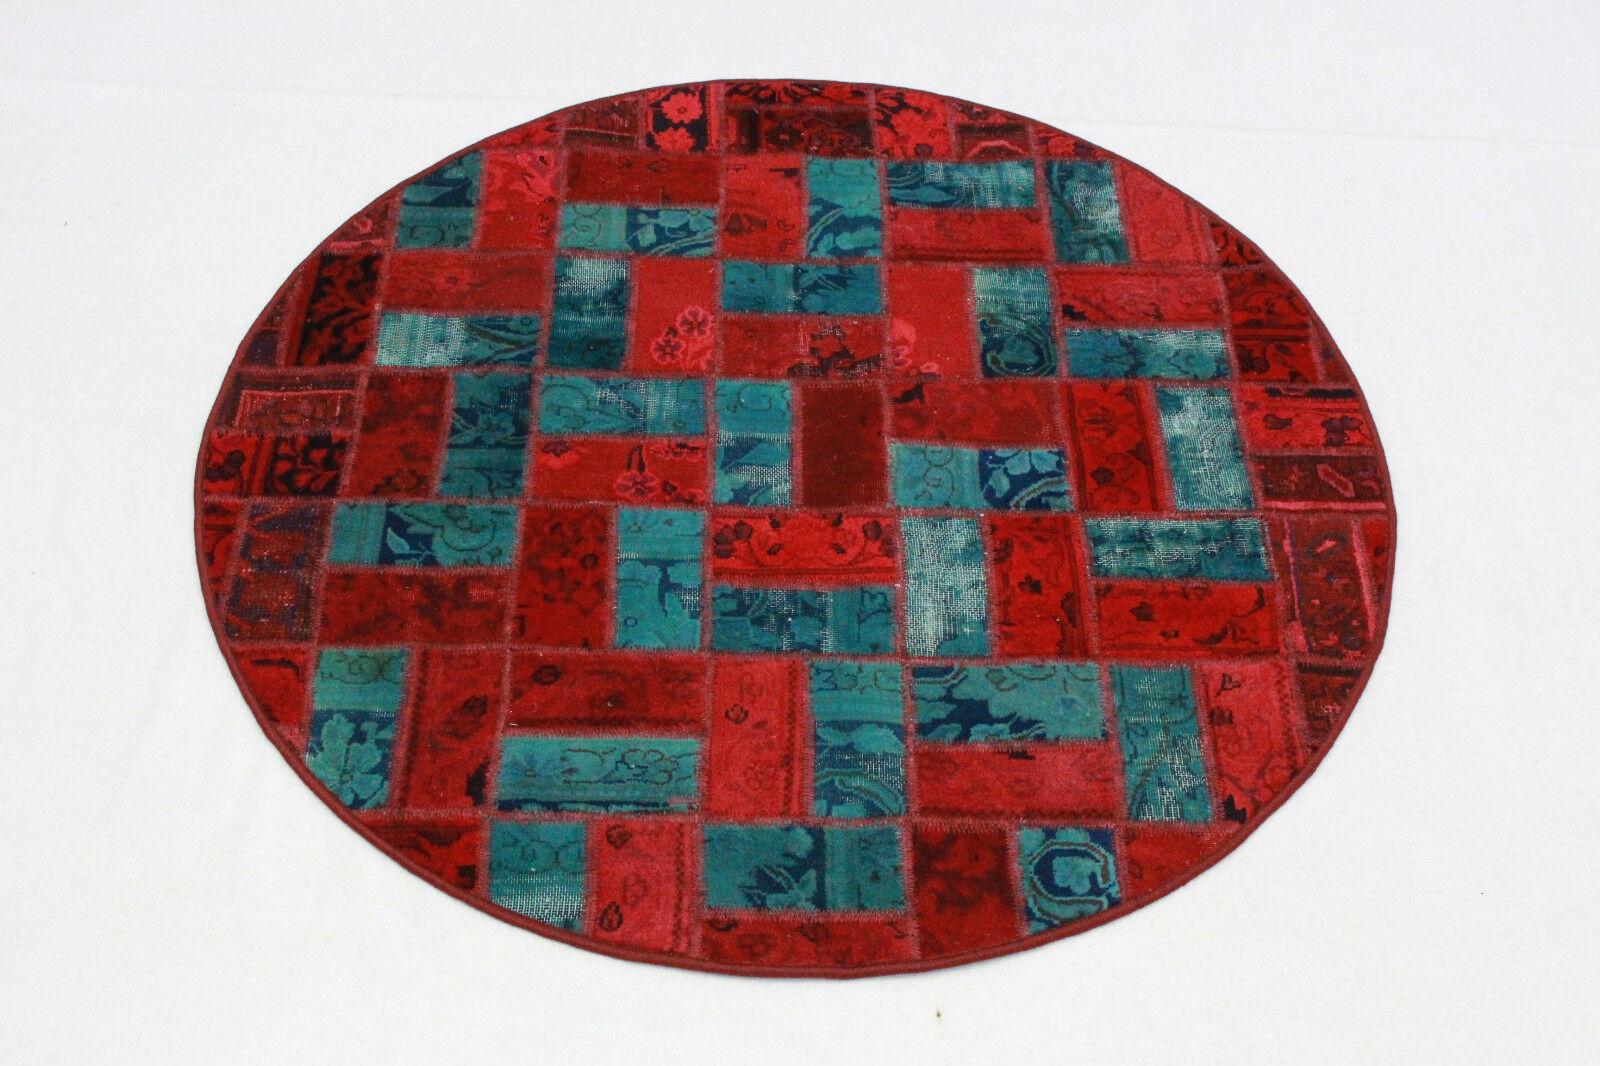 TONDO PATCHWORK Vintage Tappeto Orientale Moderno 135 cm blu rosso a mano intessuti 2179